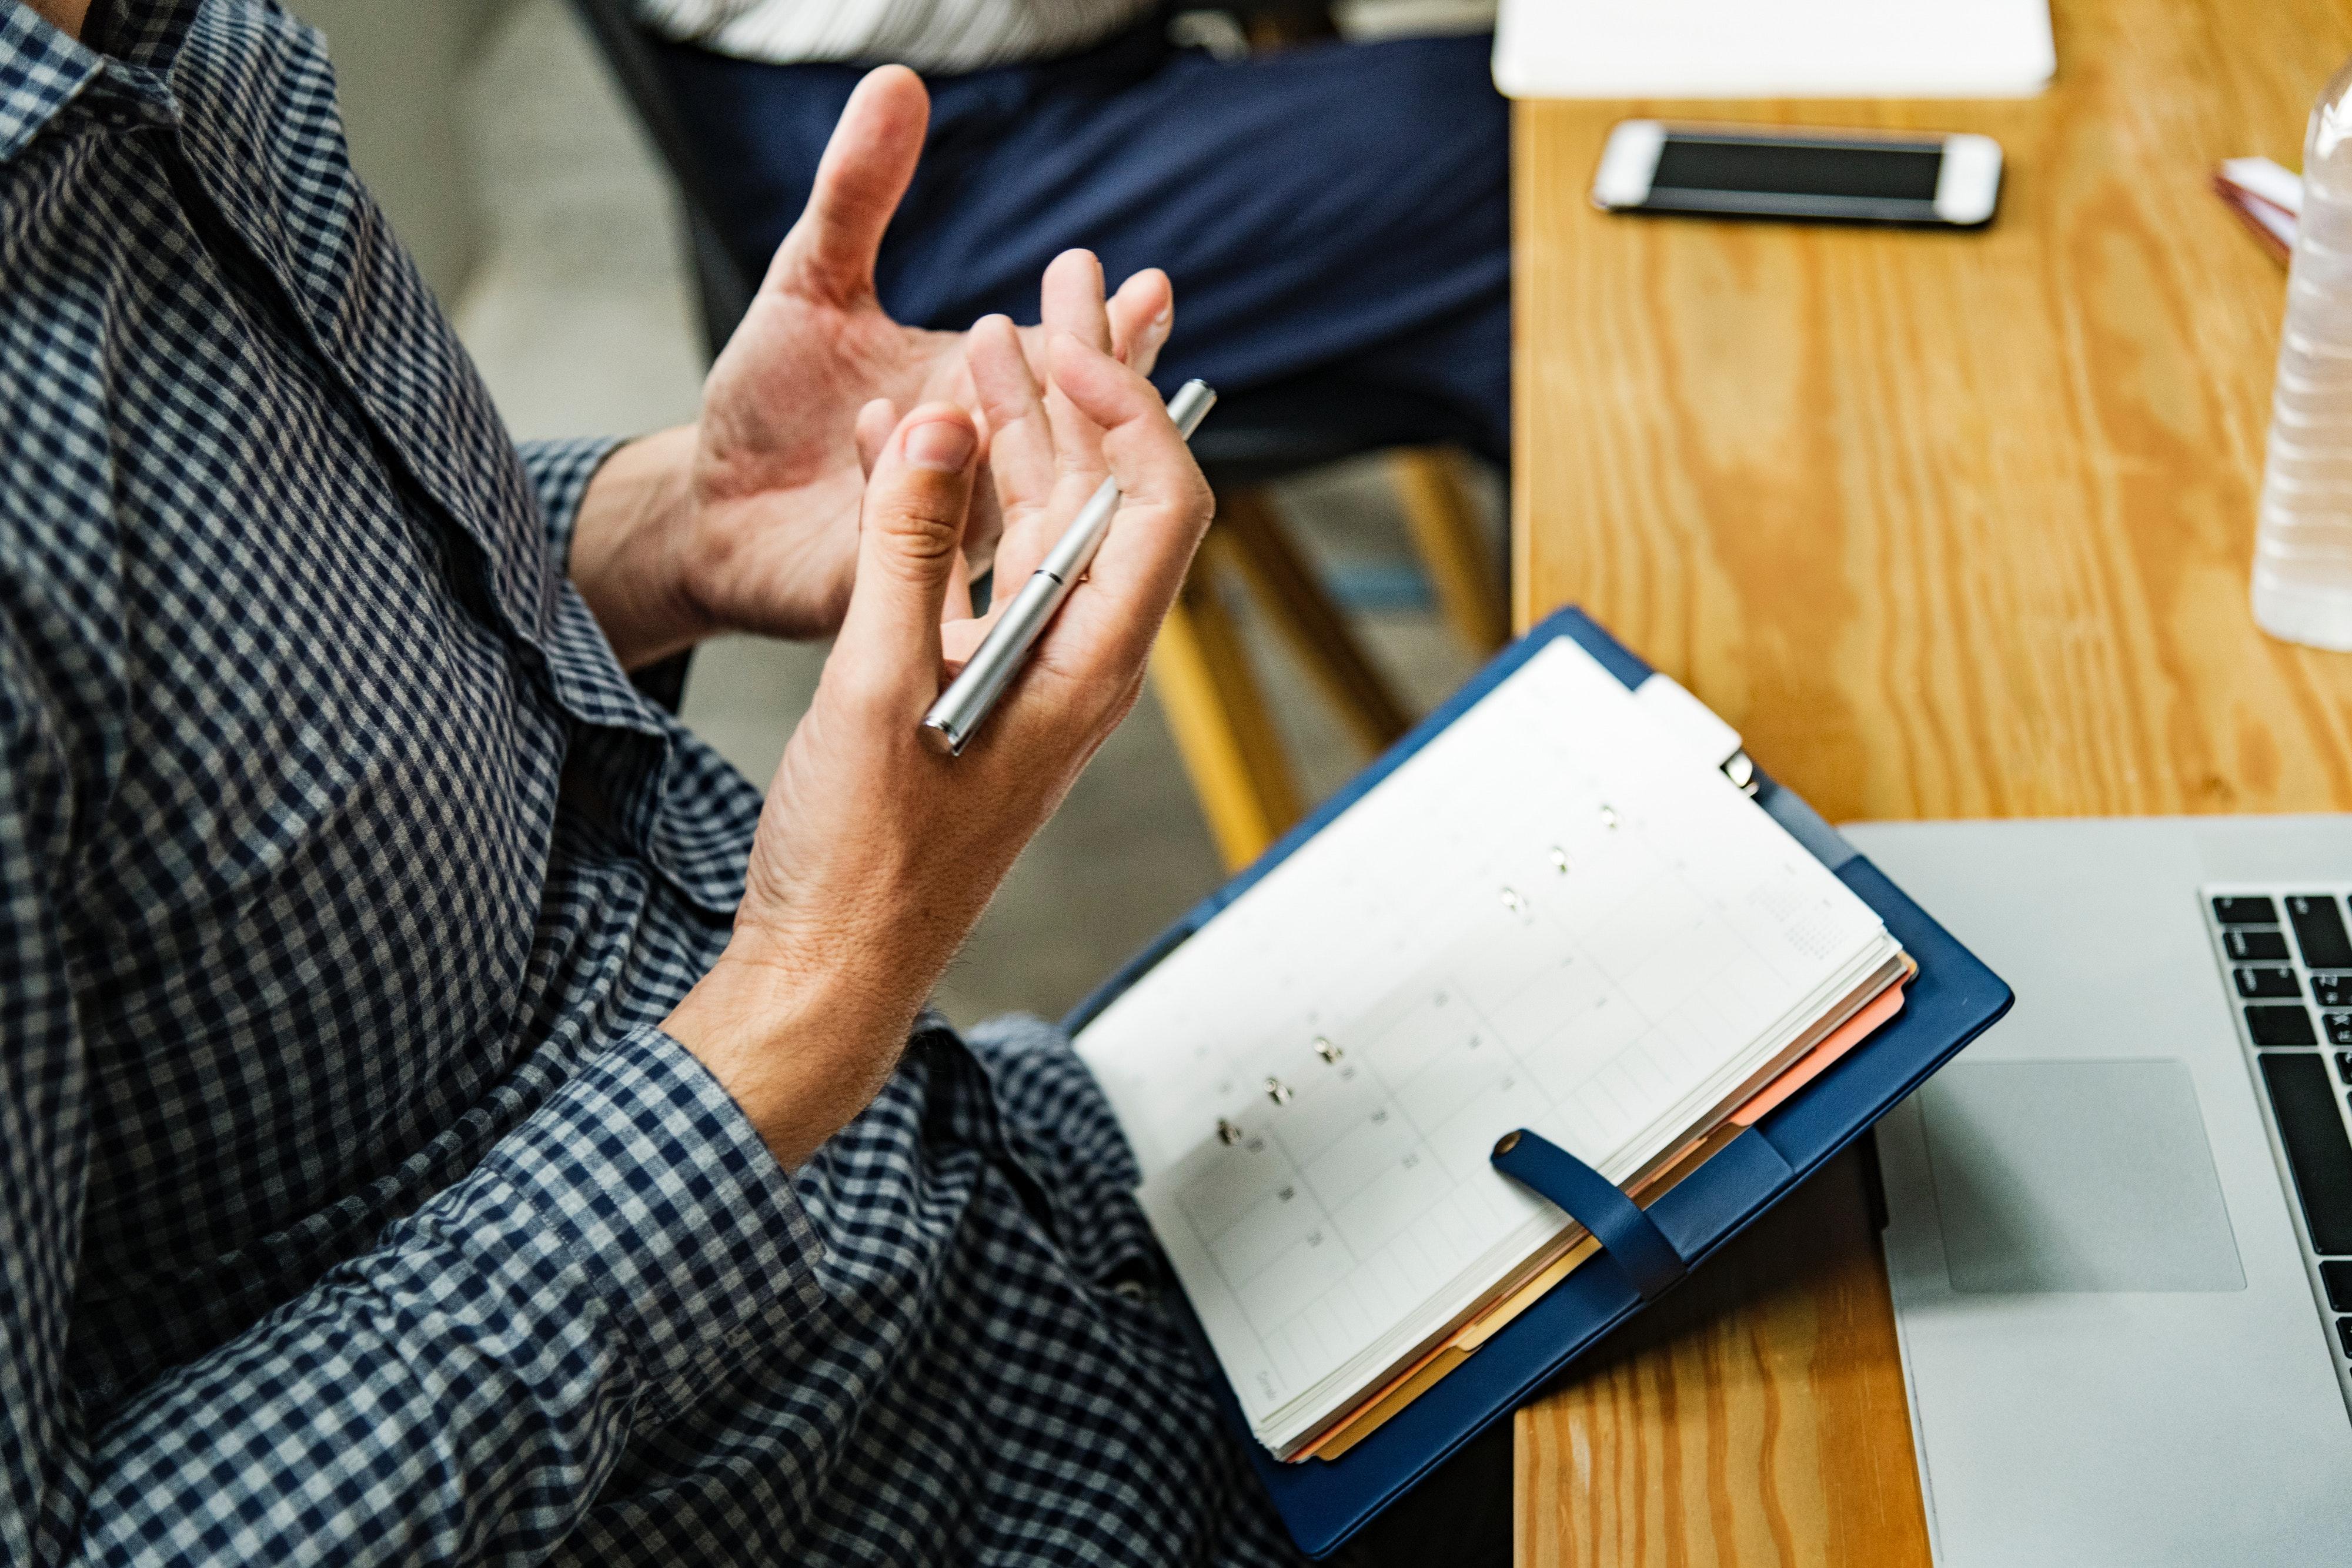 adults-agenda-brainstorming-1451449